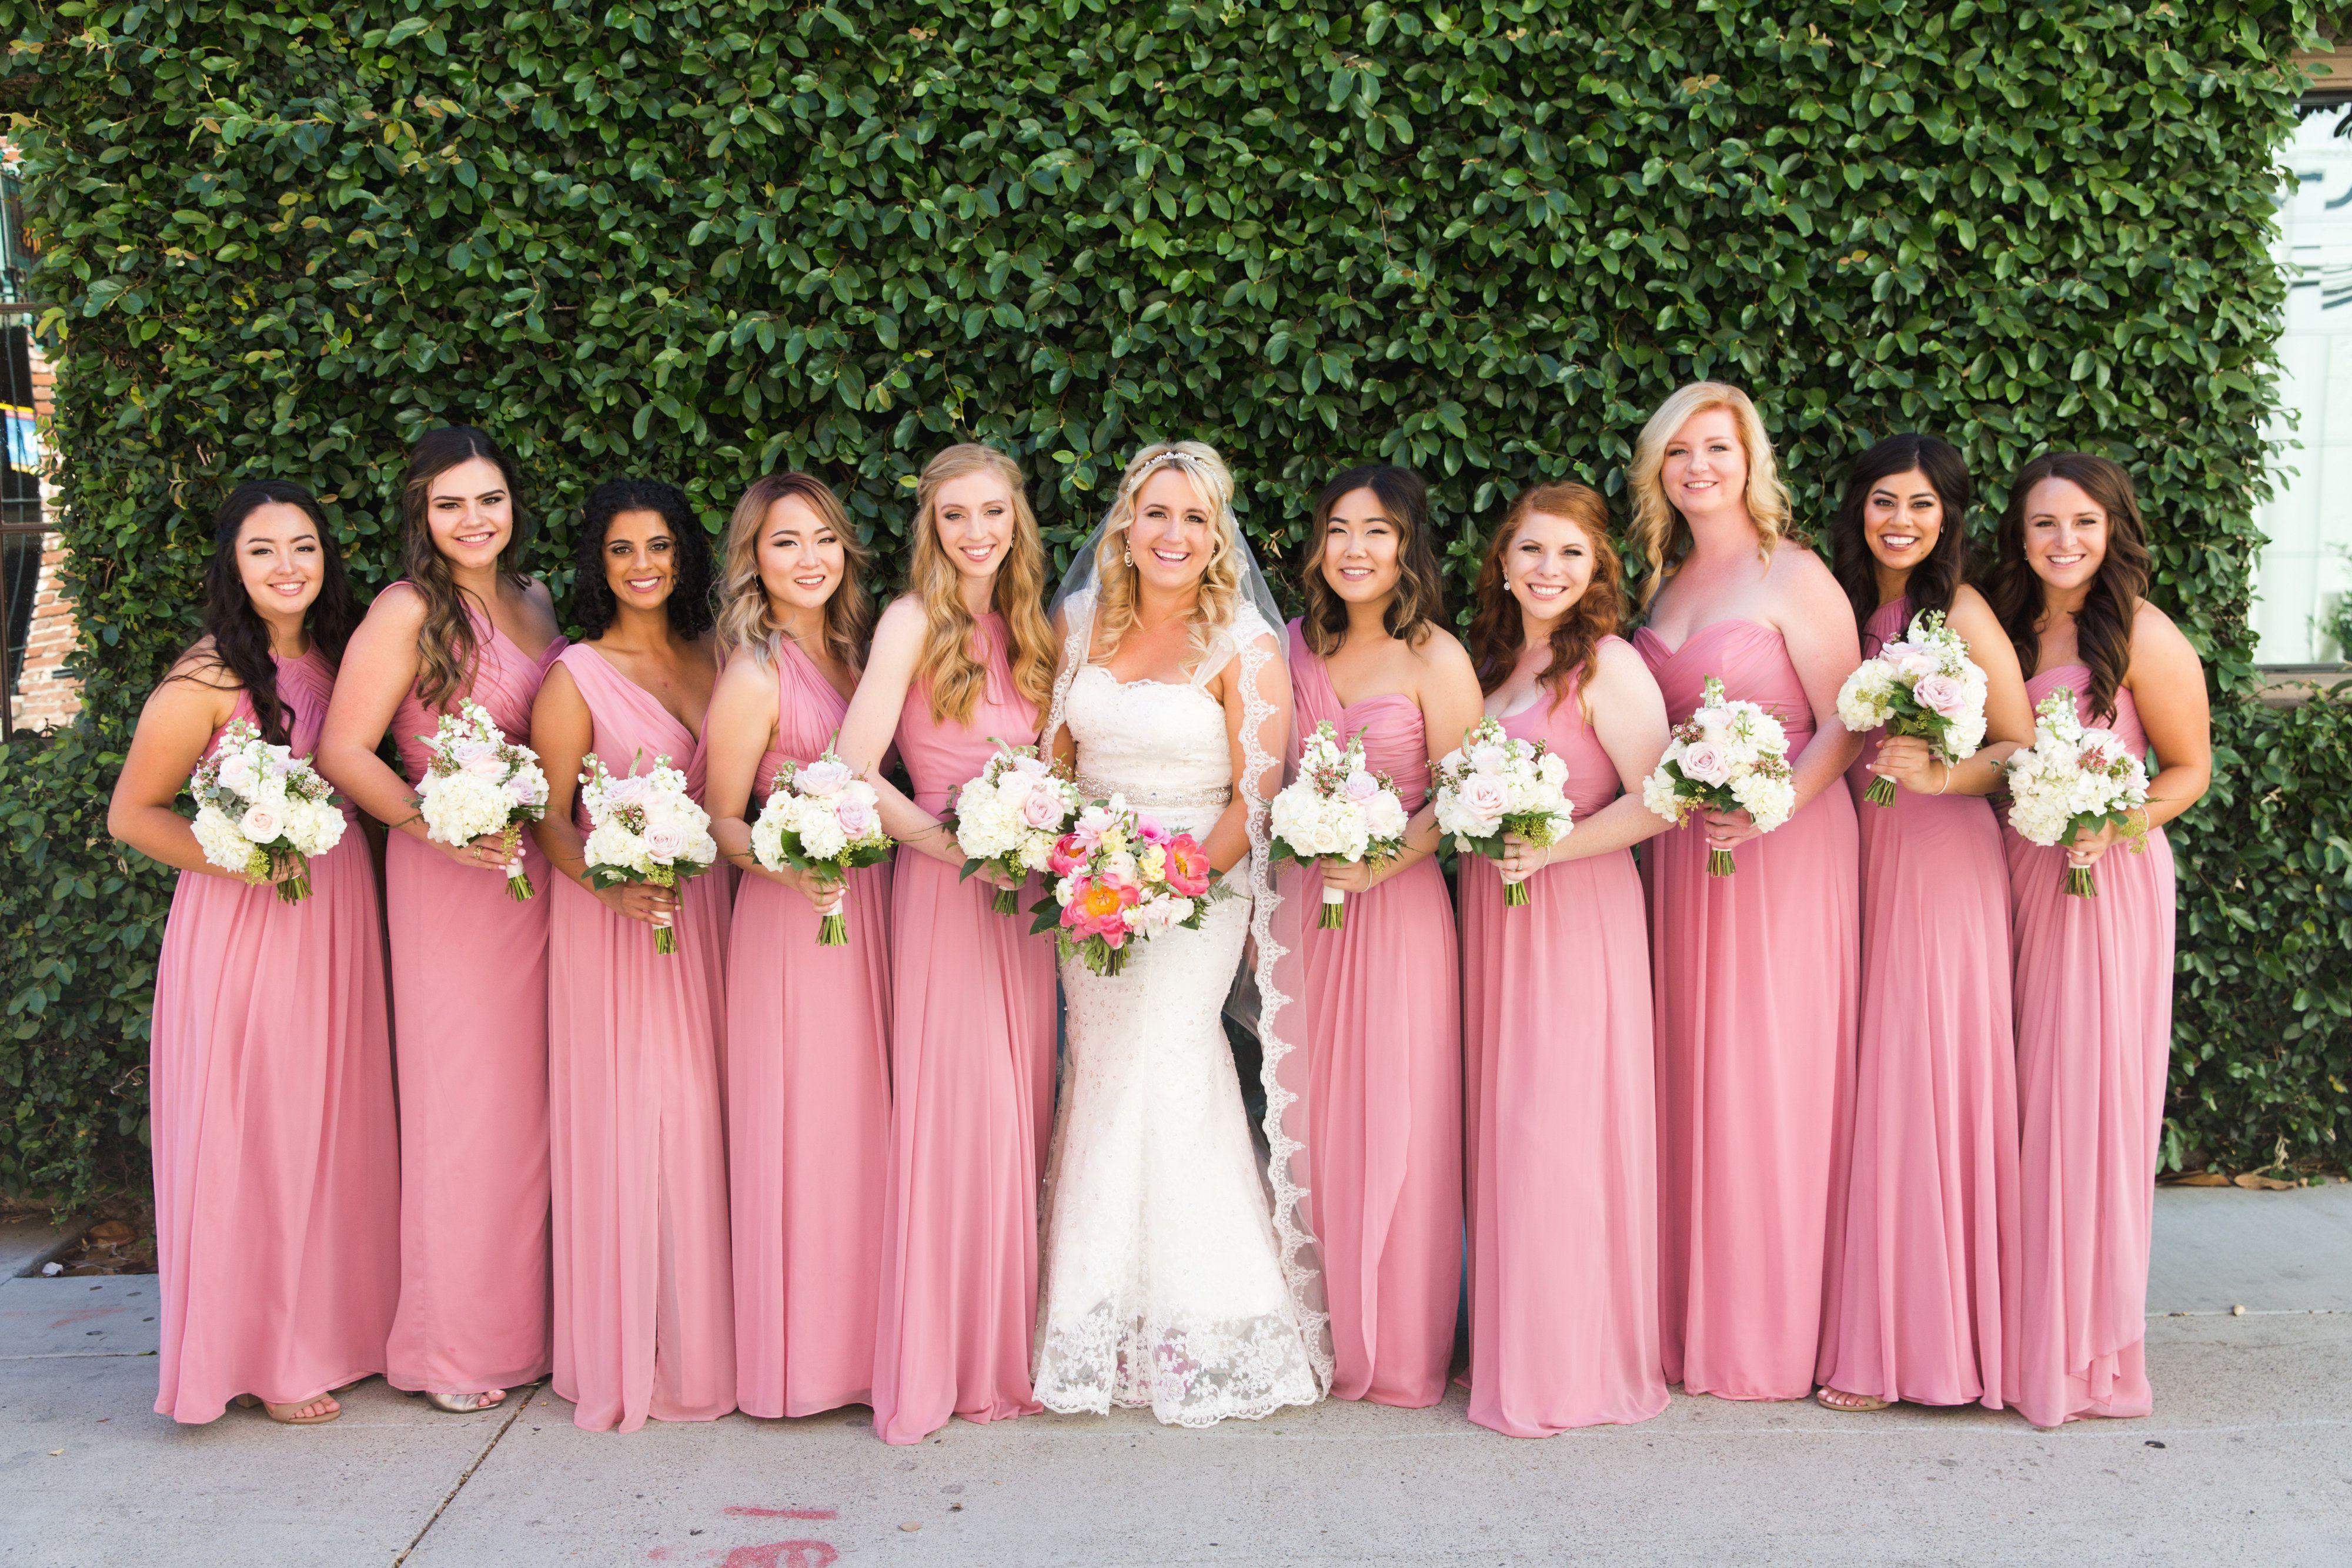 Dessy #carnation #bellabridesmaids #bridesmaids #dresses #wedding ...